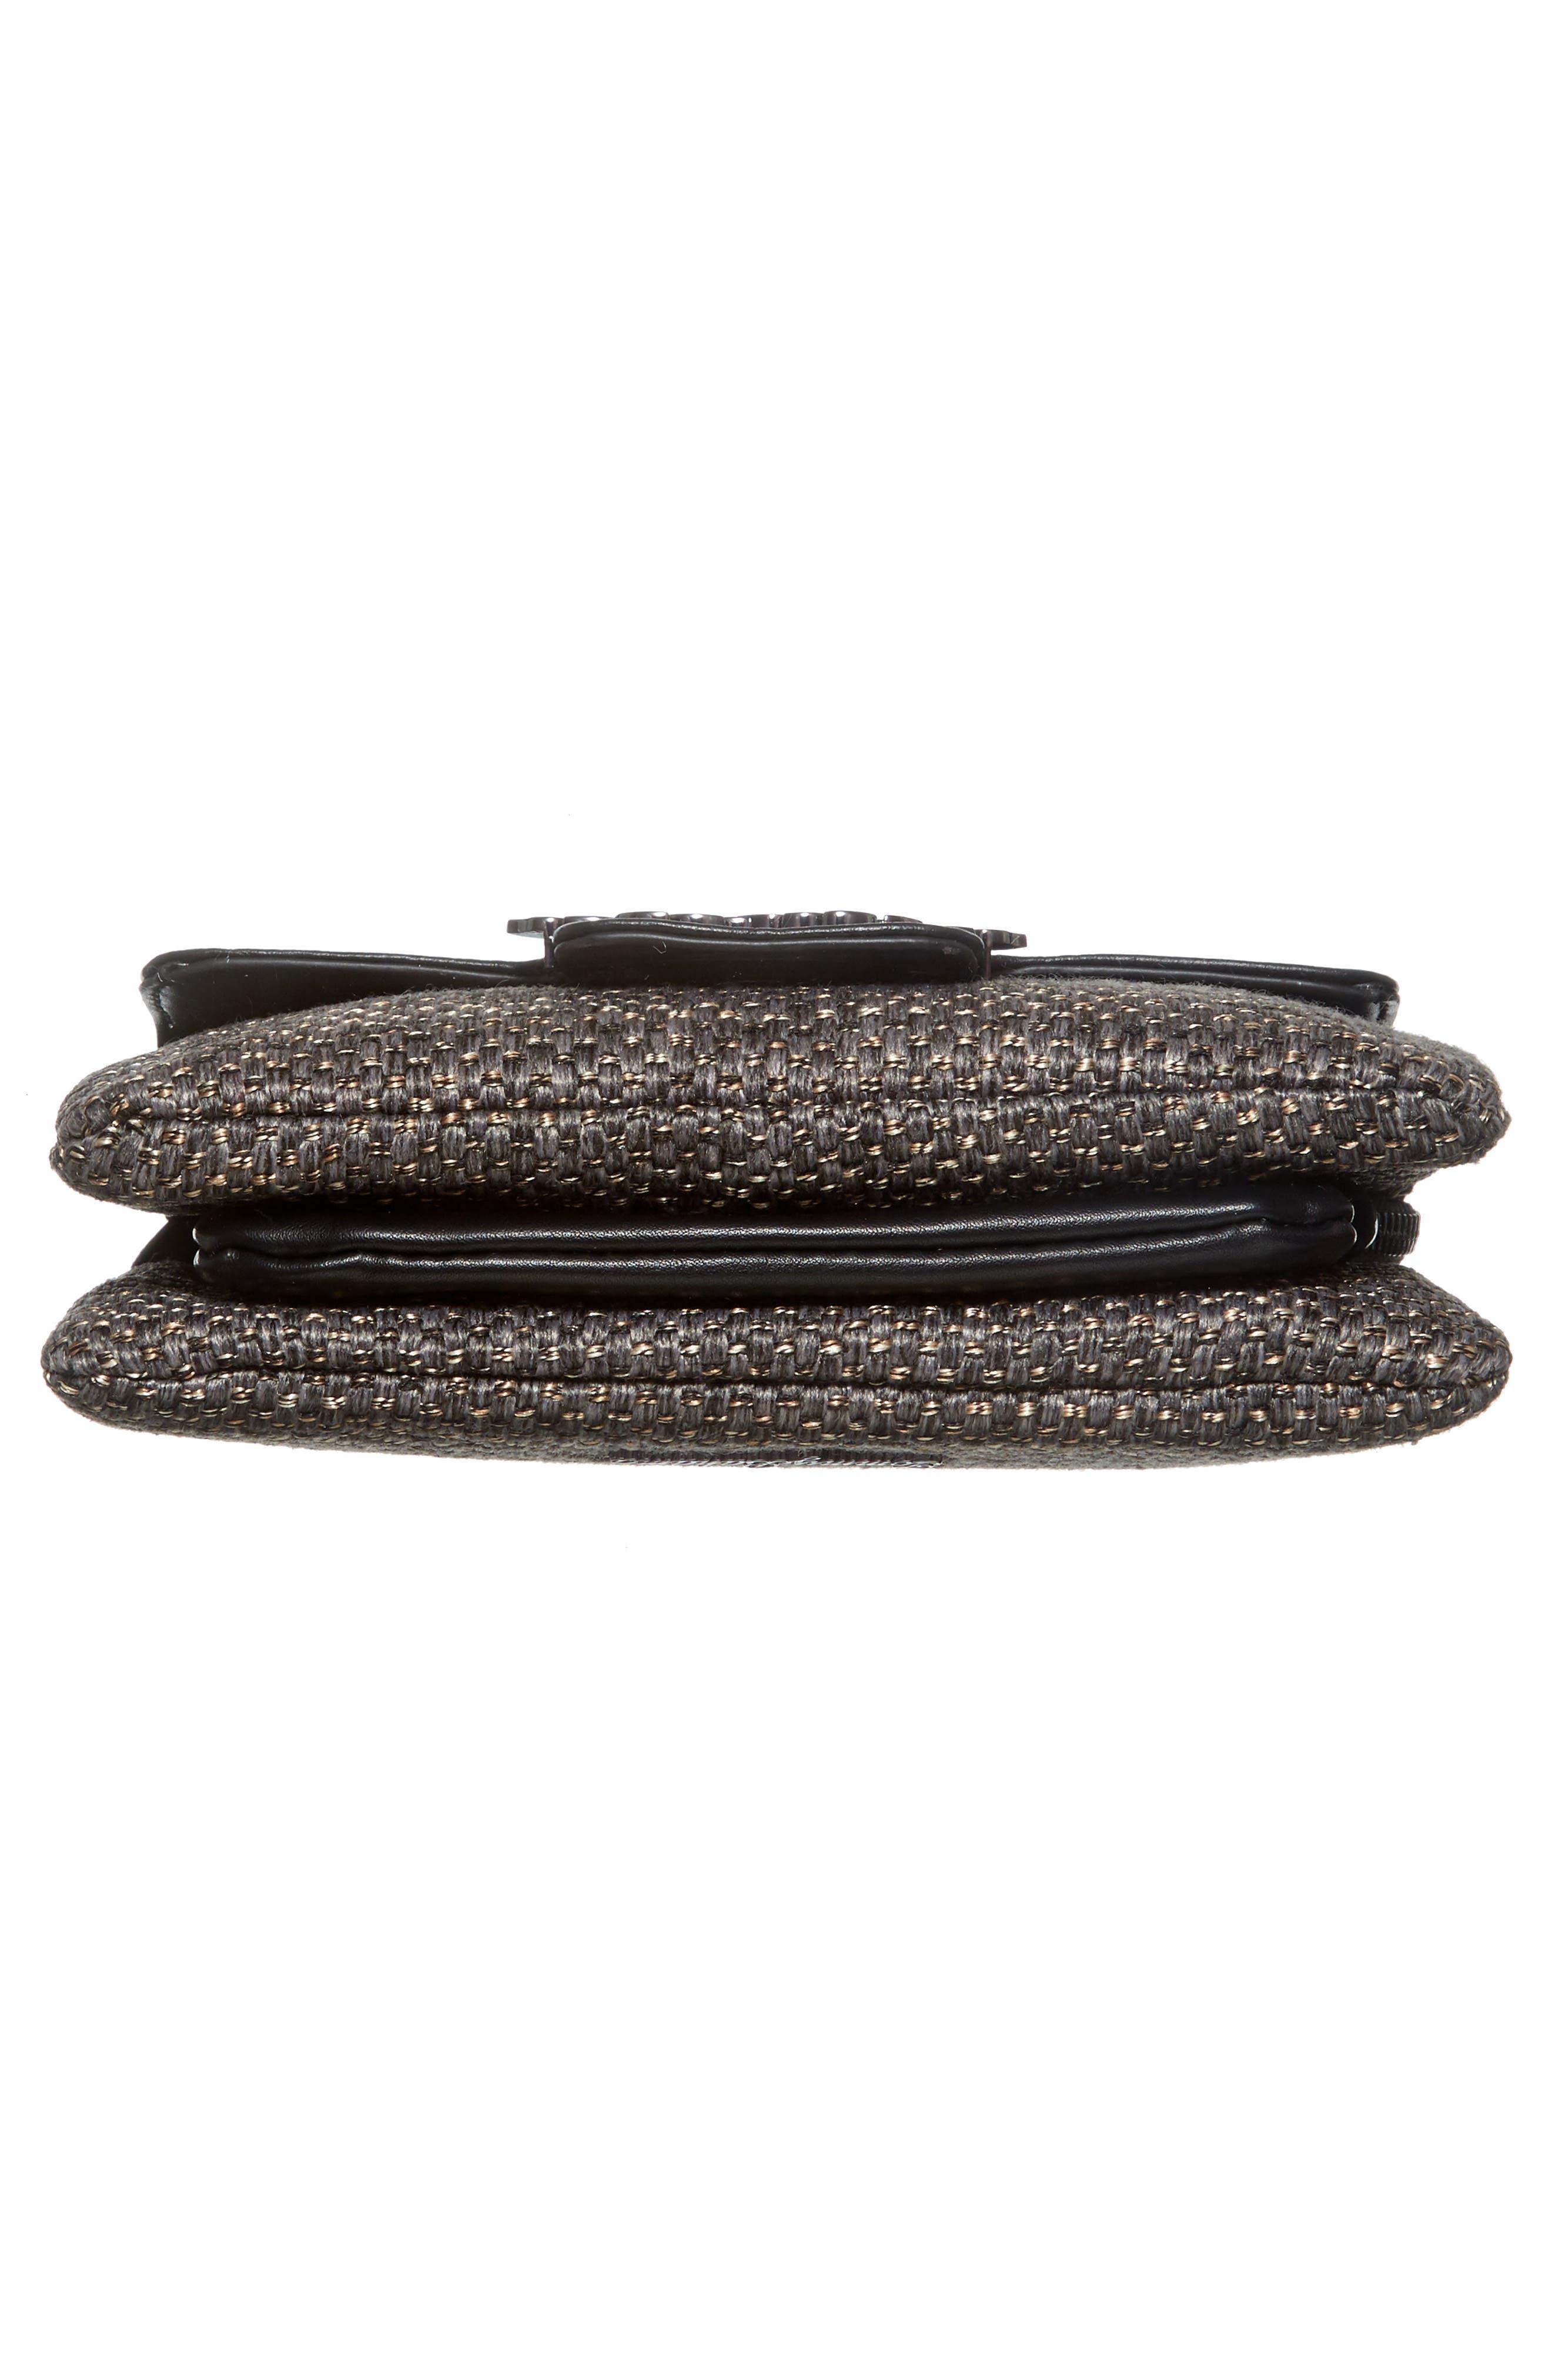 Katerini Leather Crossbody Wallet,                             Alternate thumbnail 34, color,